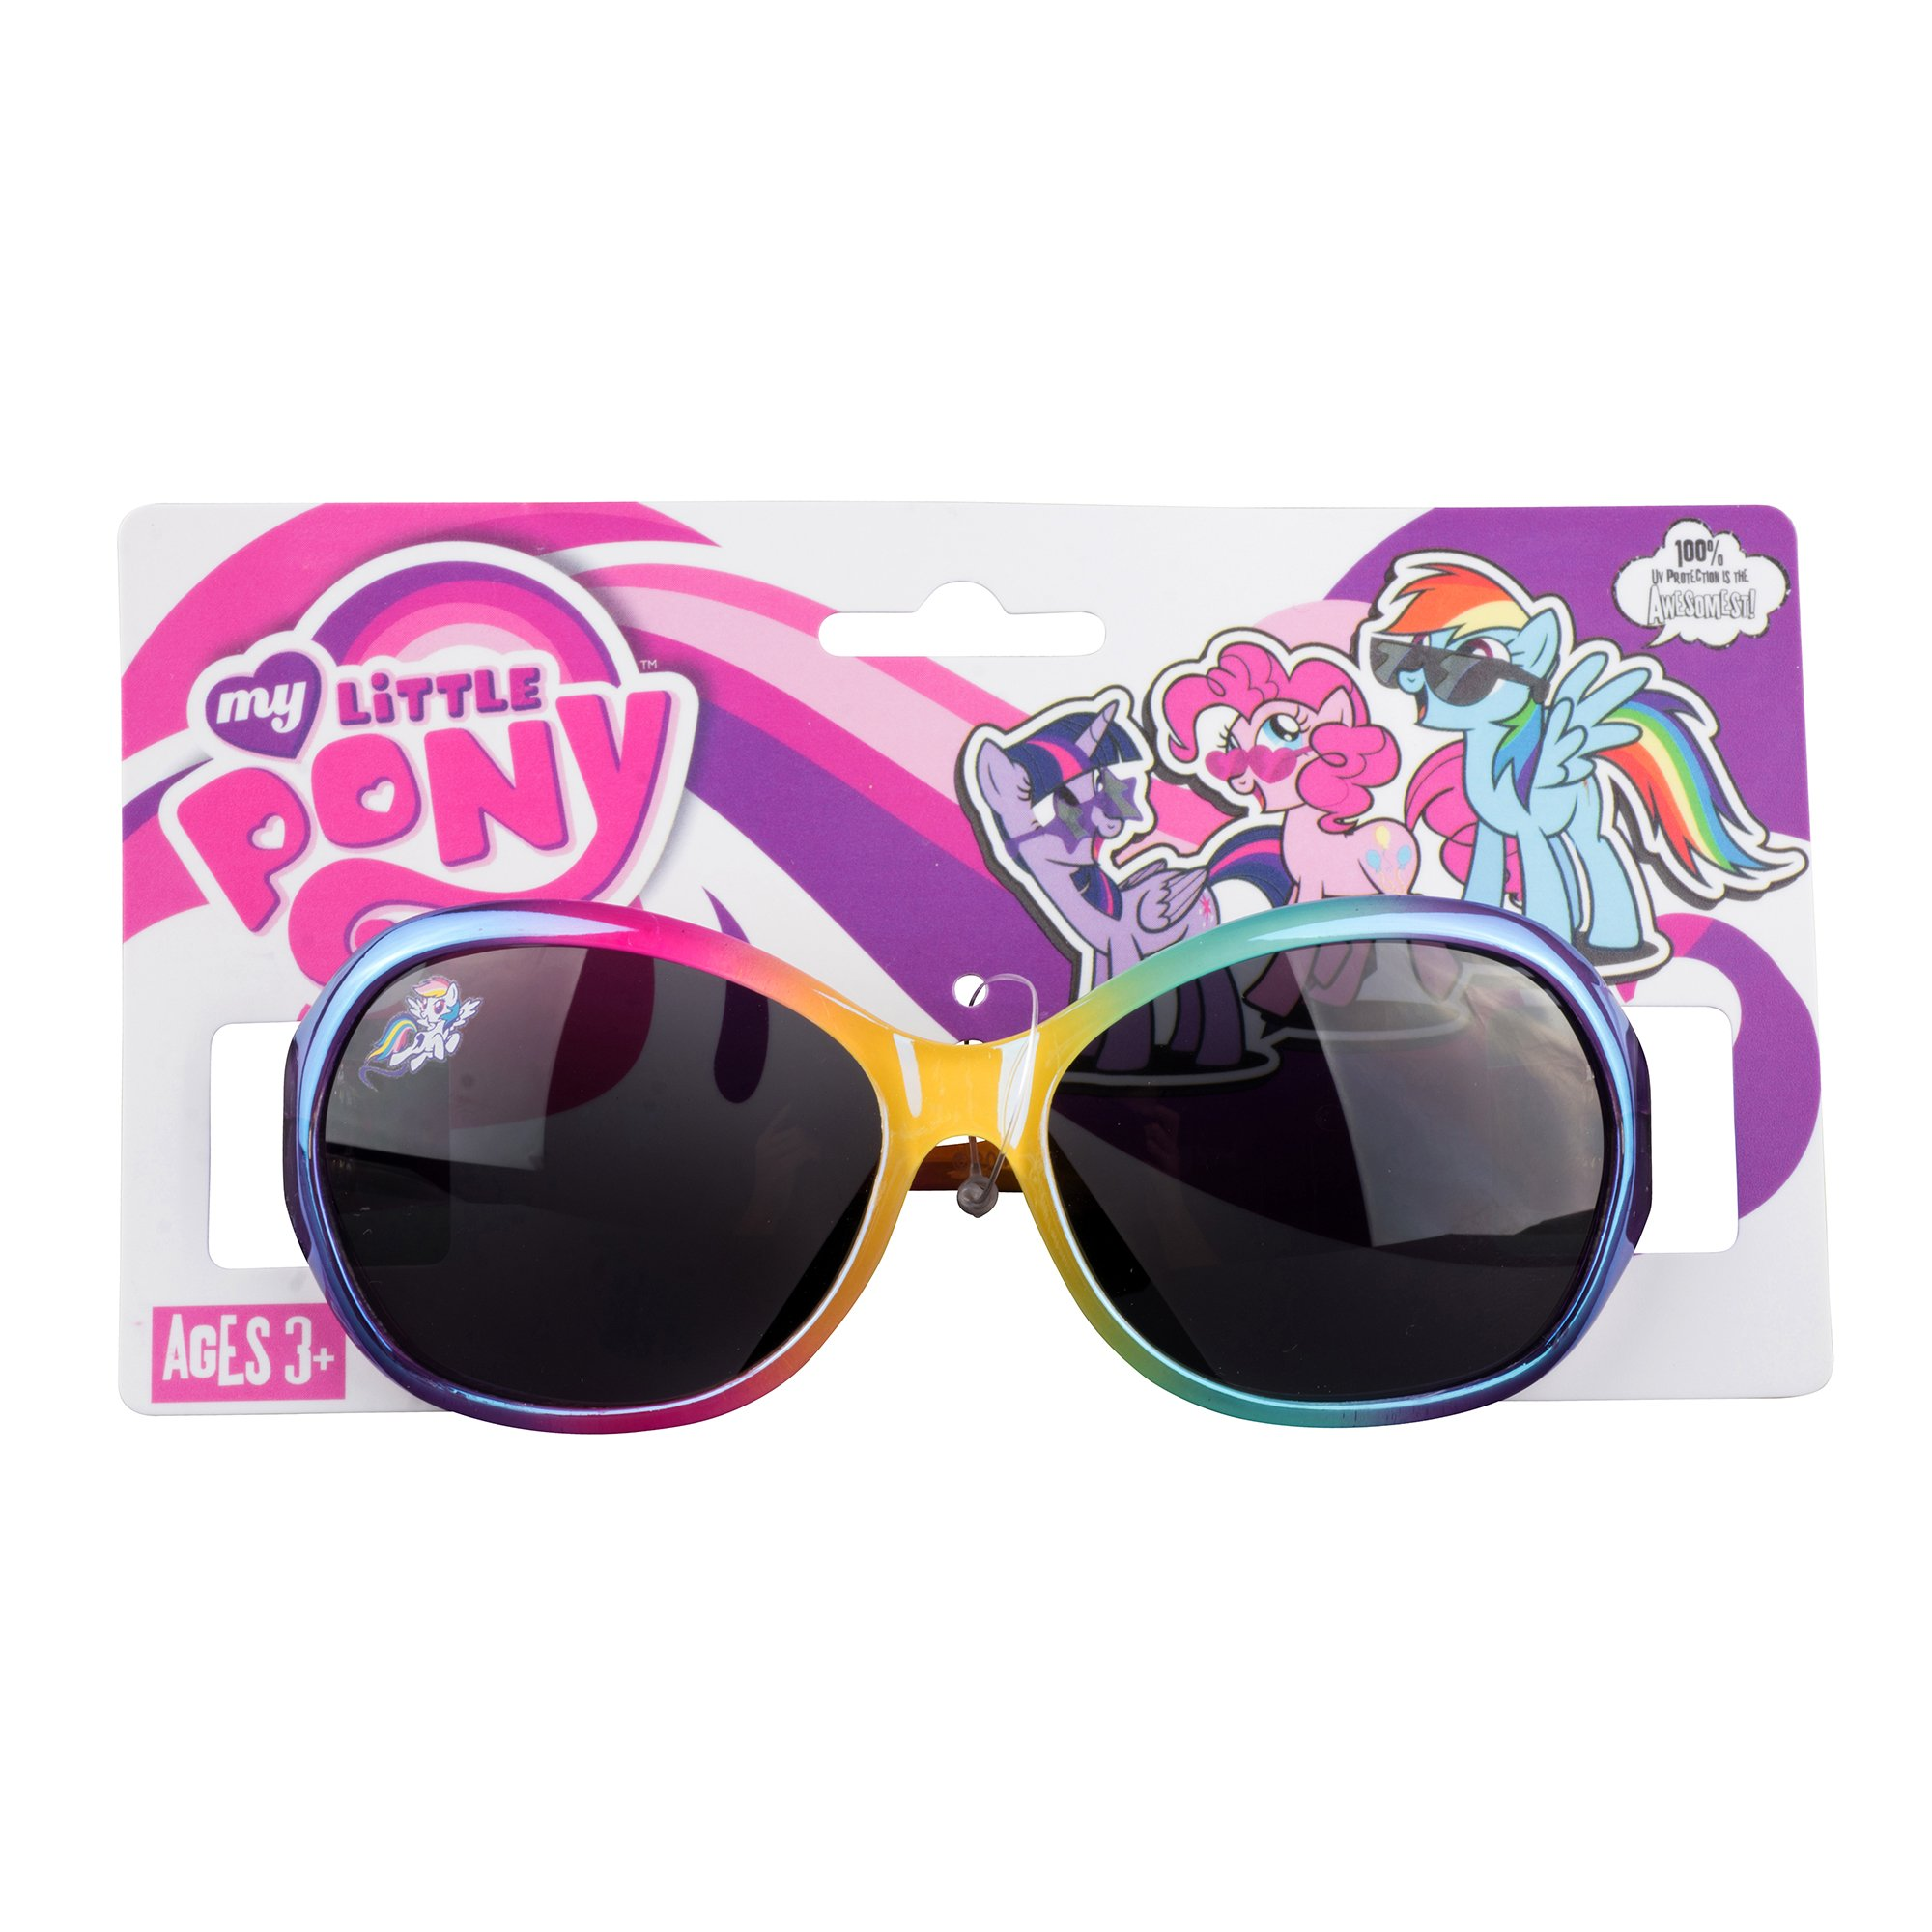 Kids Sunglasses - Popular Character Designs for Boys & Girls - 100% UV Protection for Kids